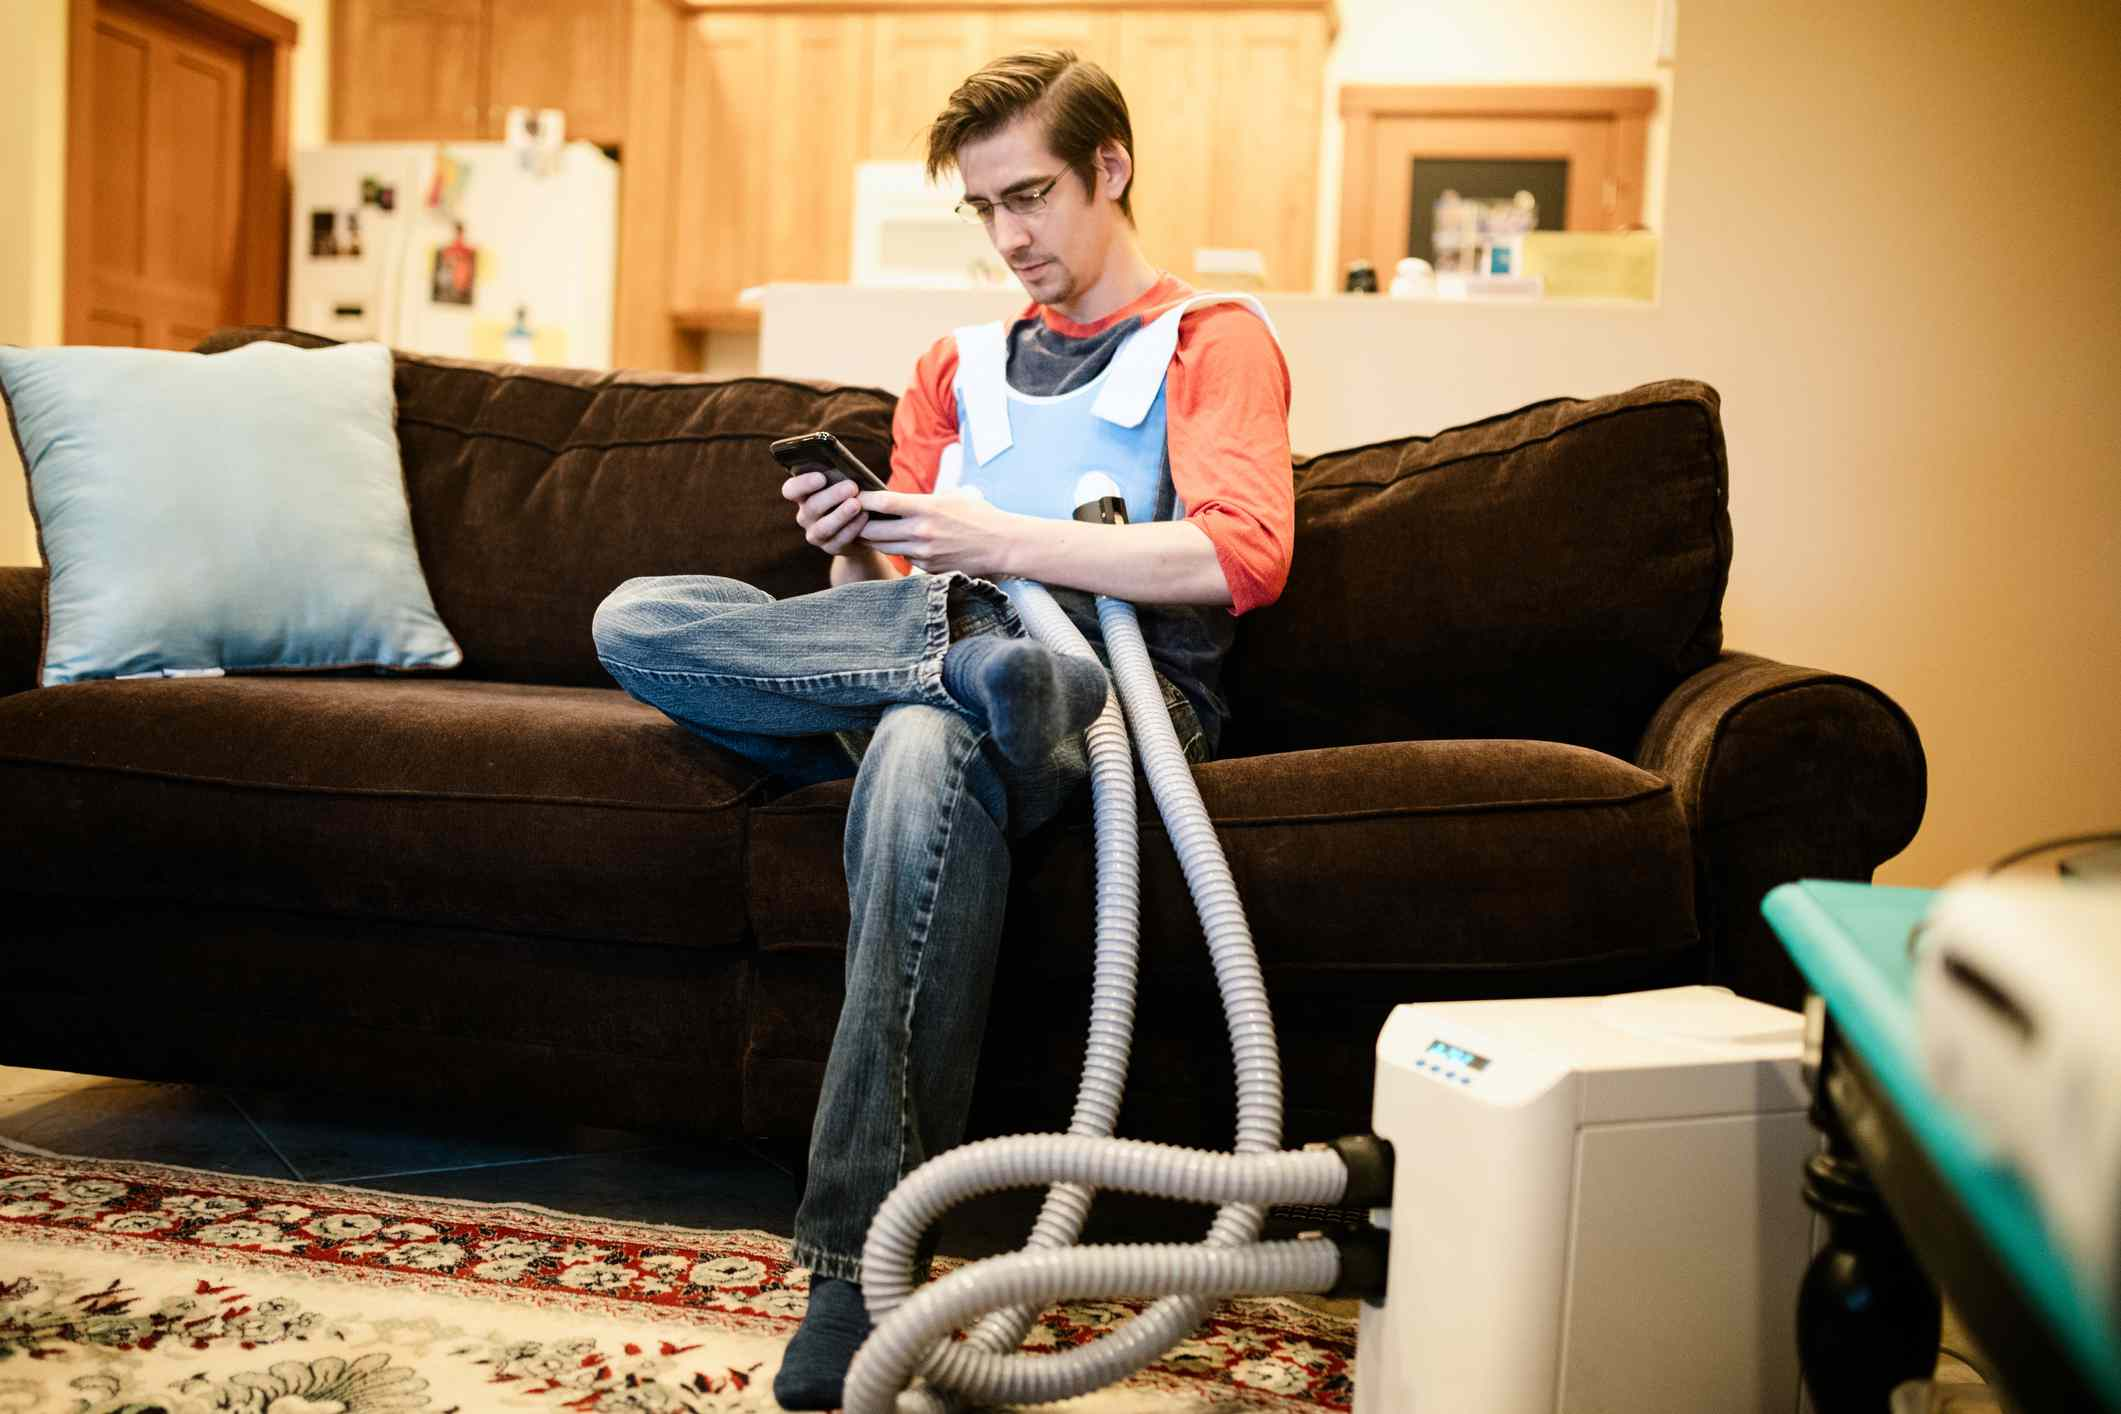 Man Using Inhaler Indoors